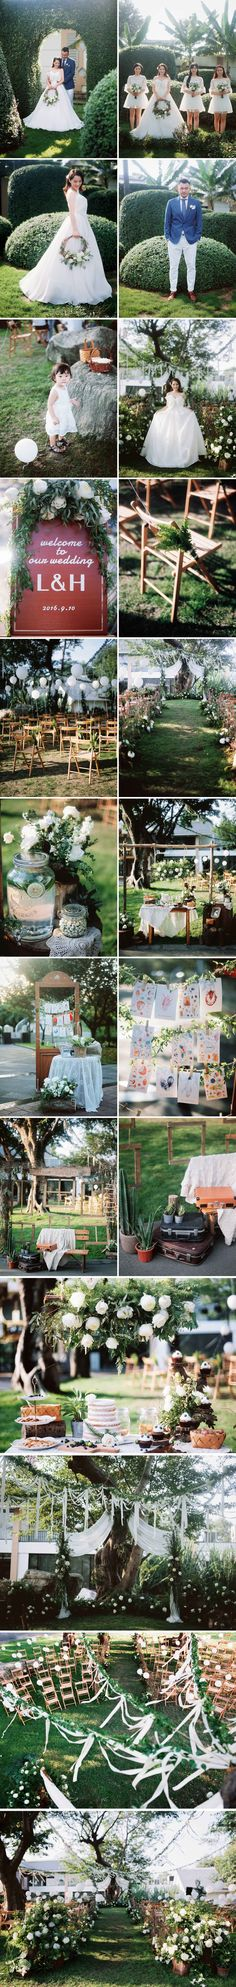 微博@摄影师时间旅行 胶片婚礼 WEDDING Mamiya 645 AFD